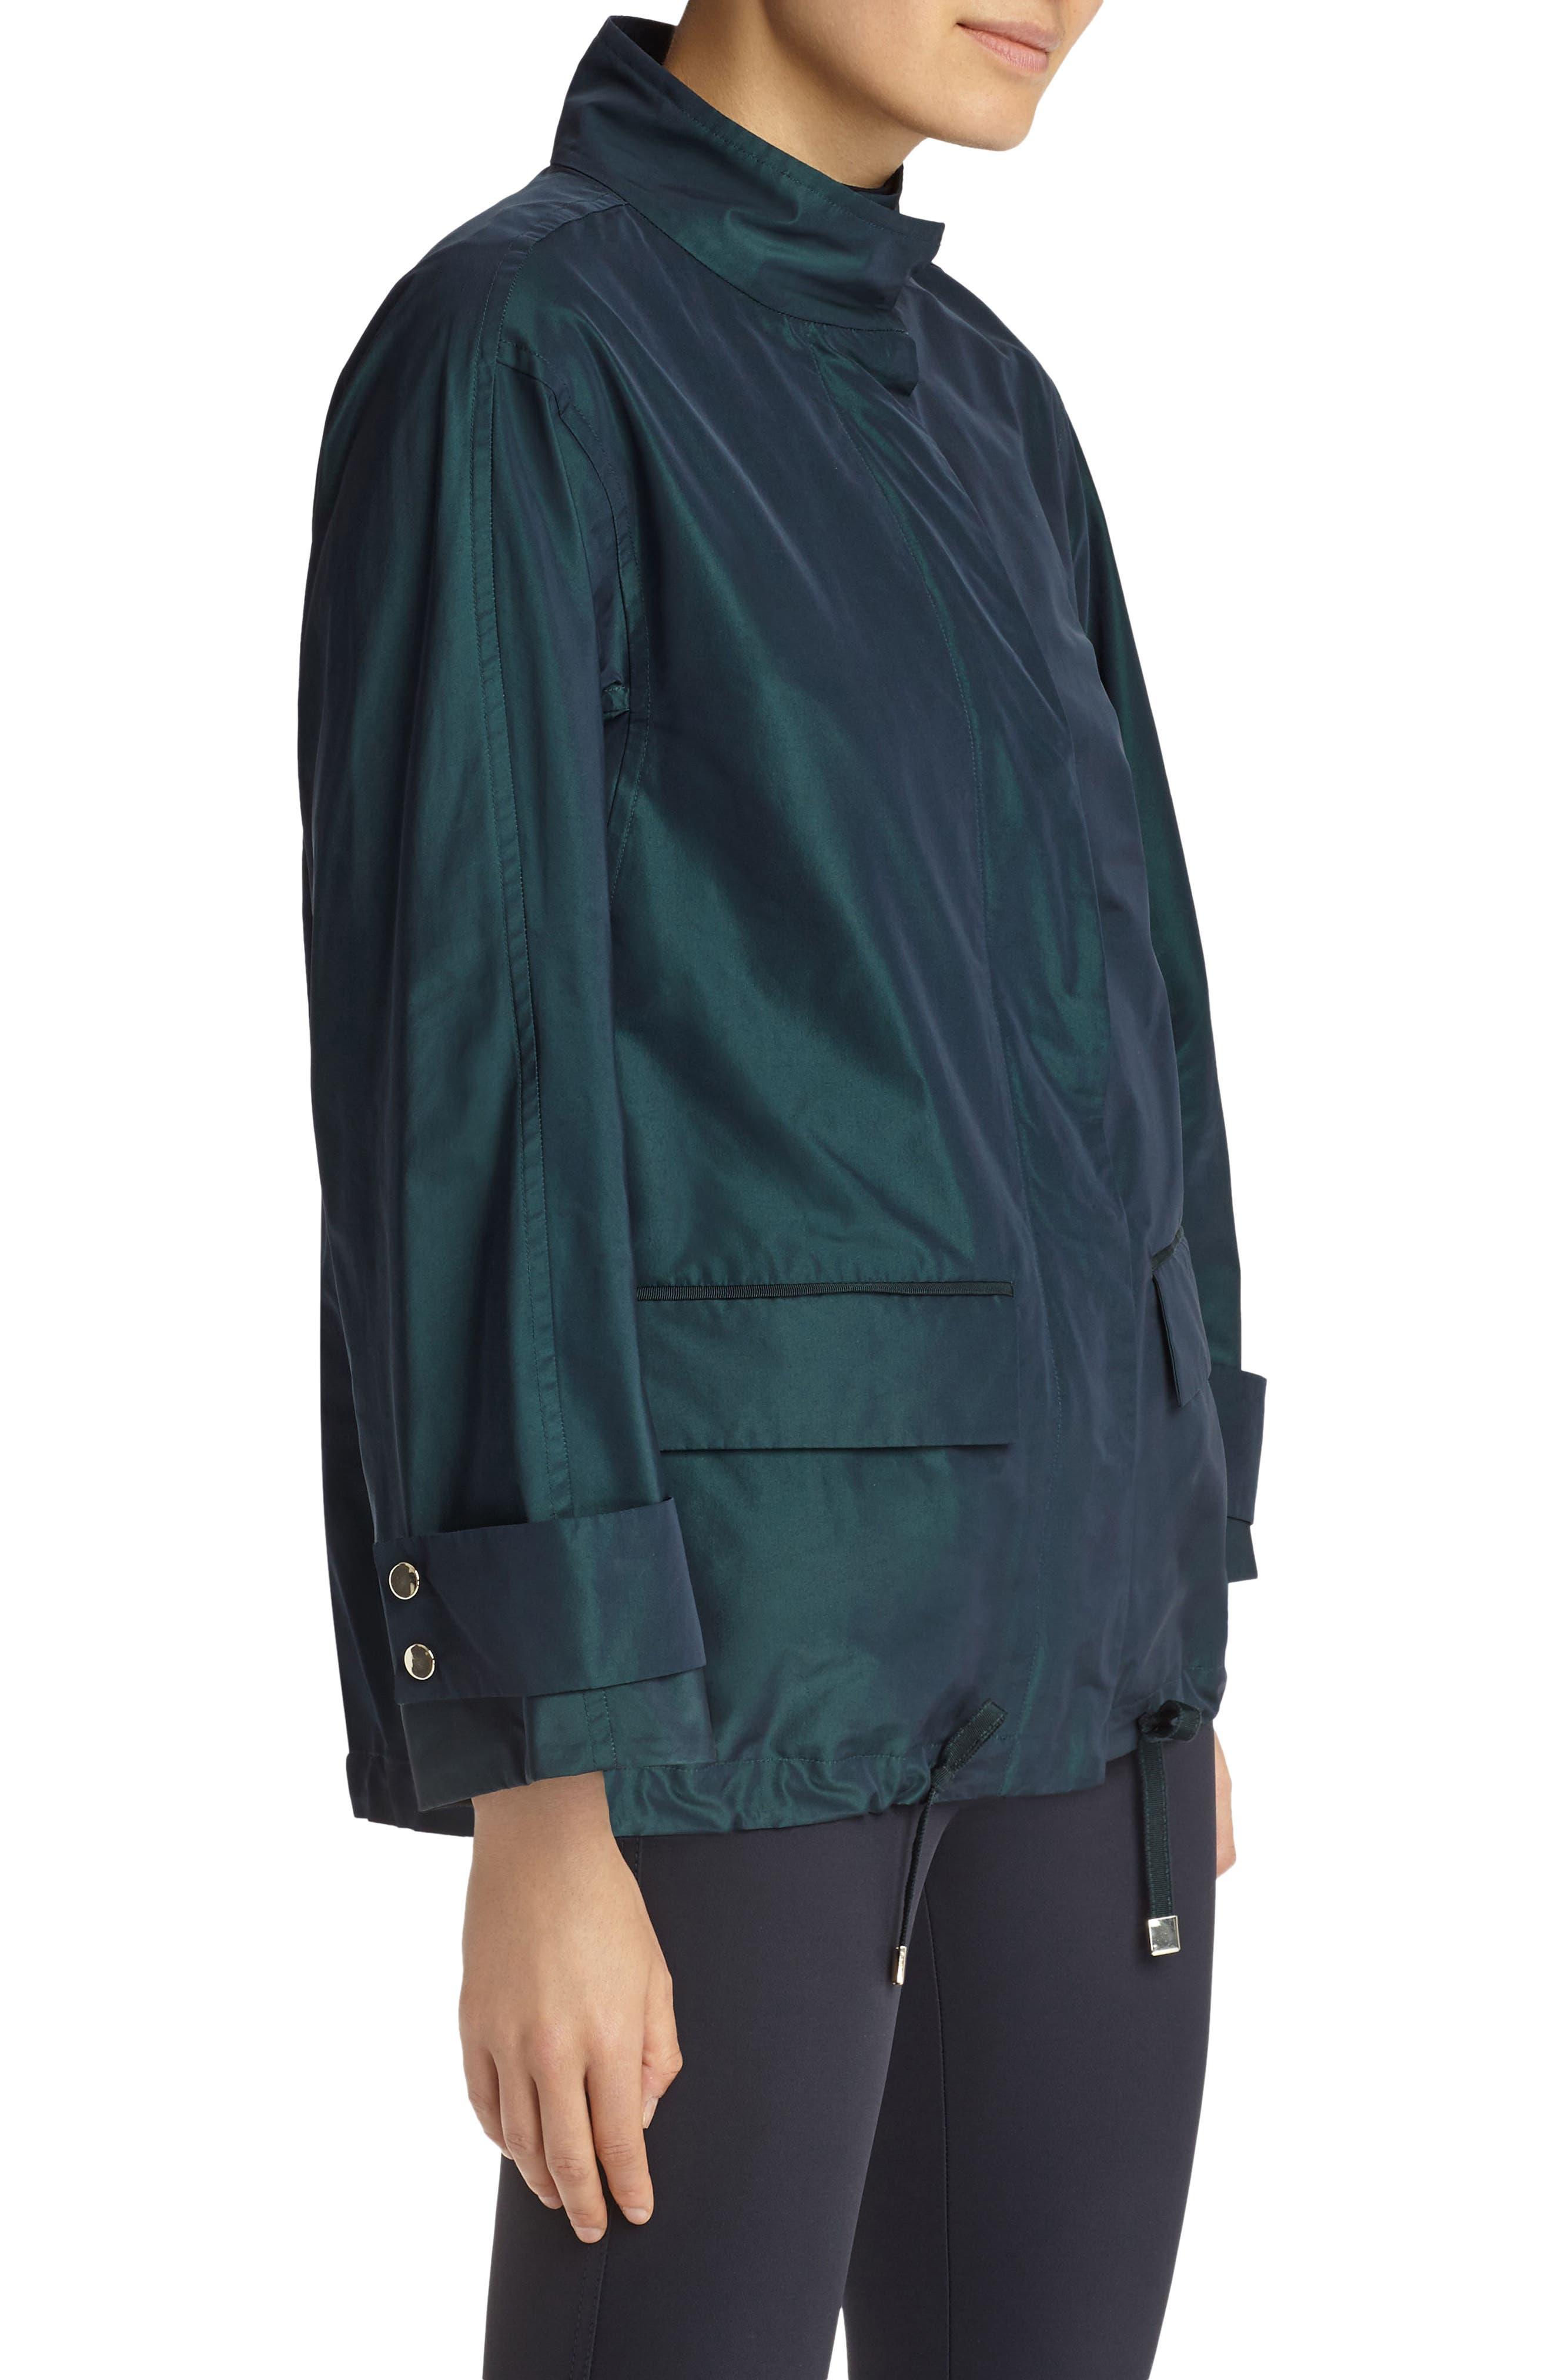 Markus Empirical Tech Cloth Jacket,                             Alternate thumbnail 3, color,                             Blue Spruce Iridescent